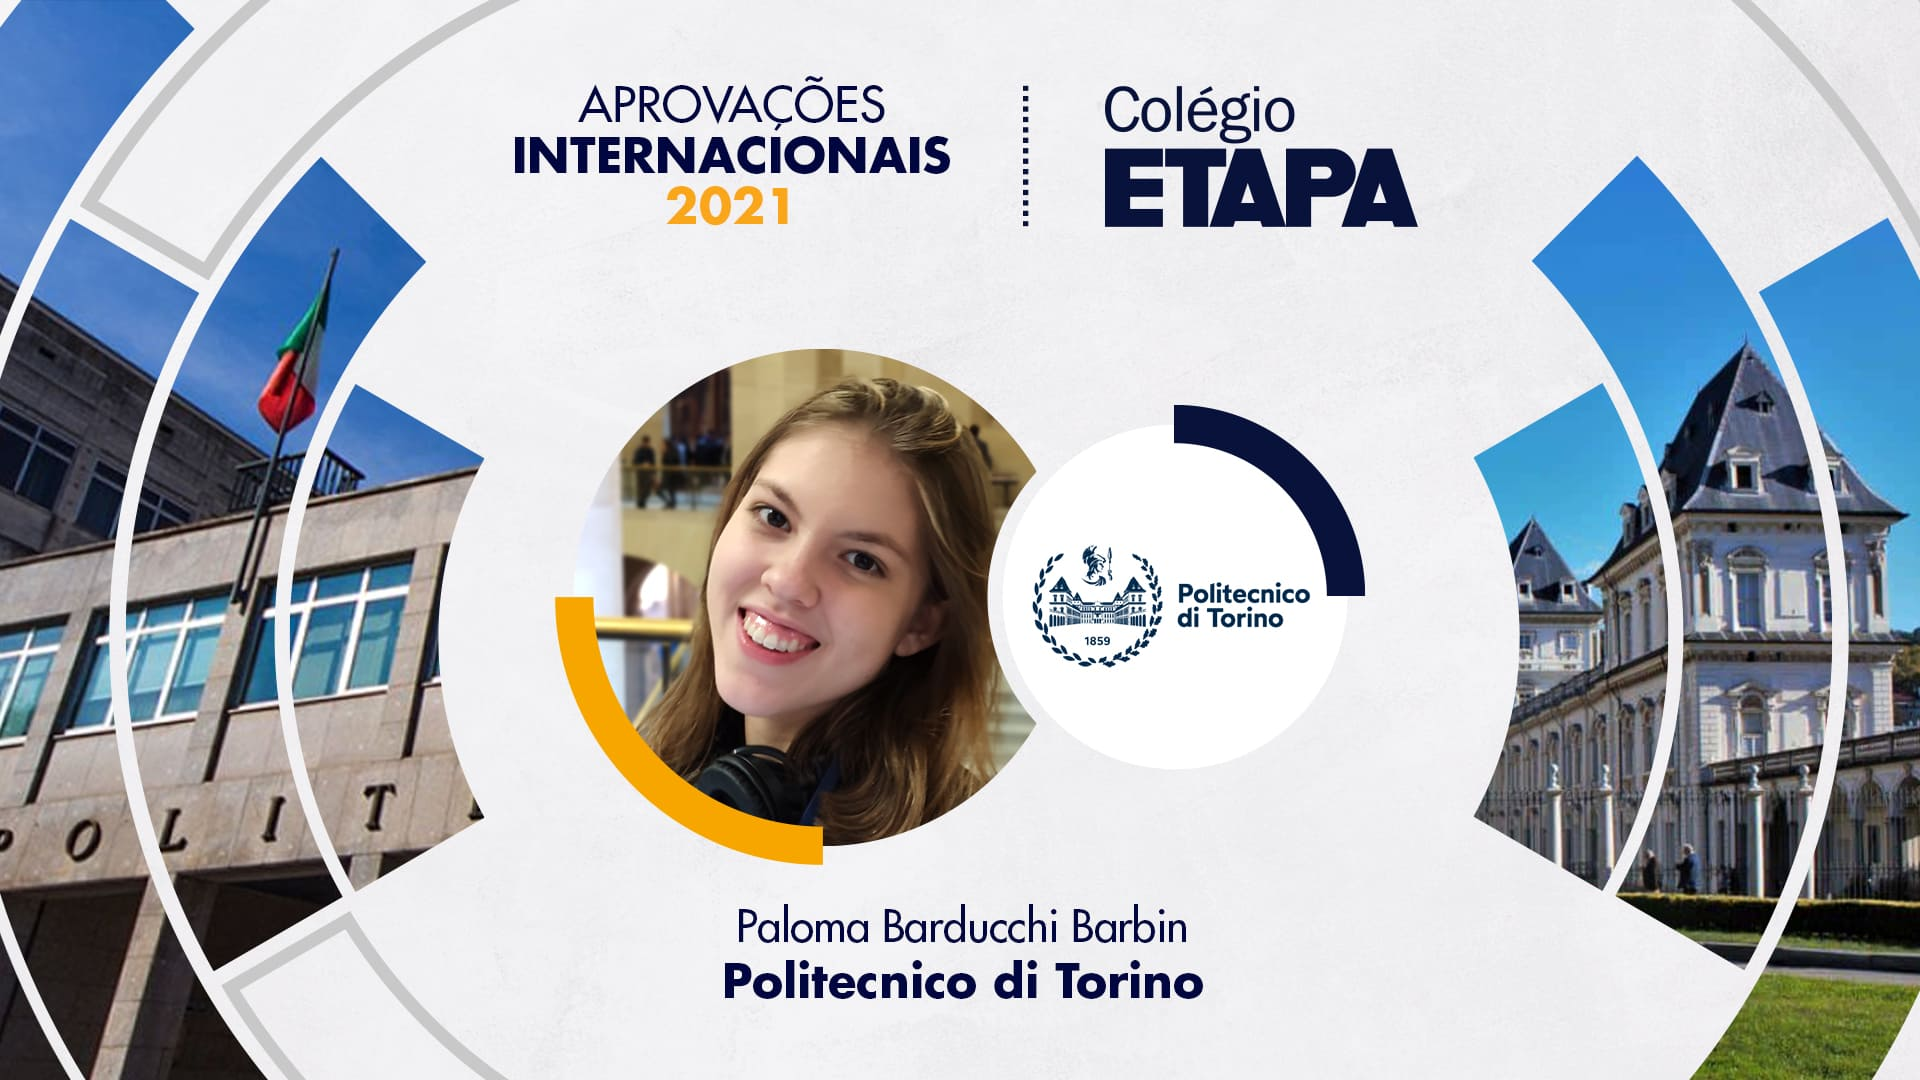 Aprovações Internacionais 2021: Paloma Barduchi Barbin